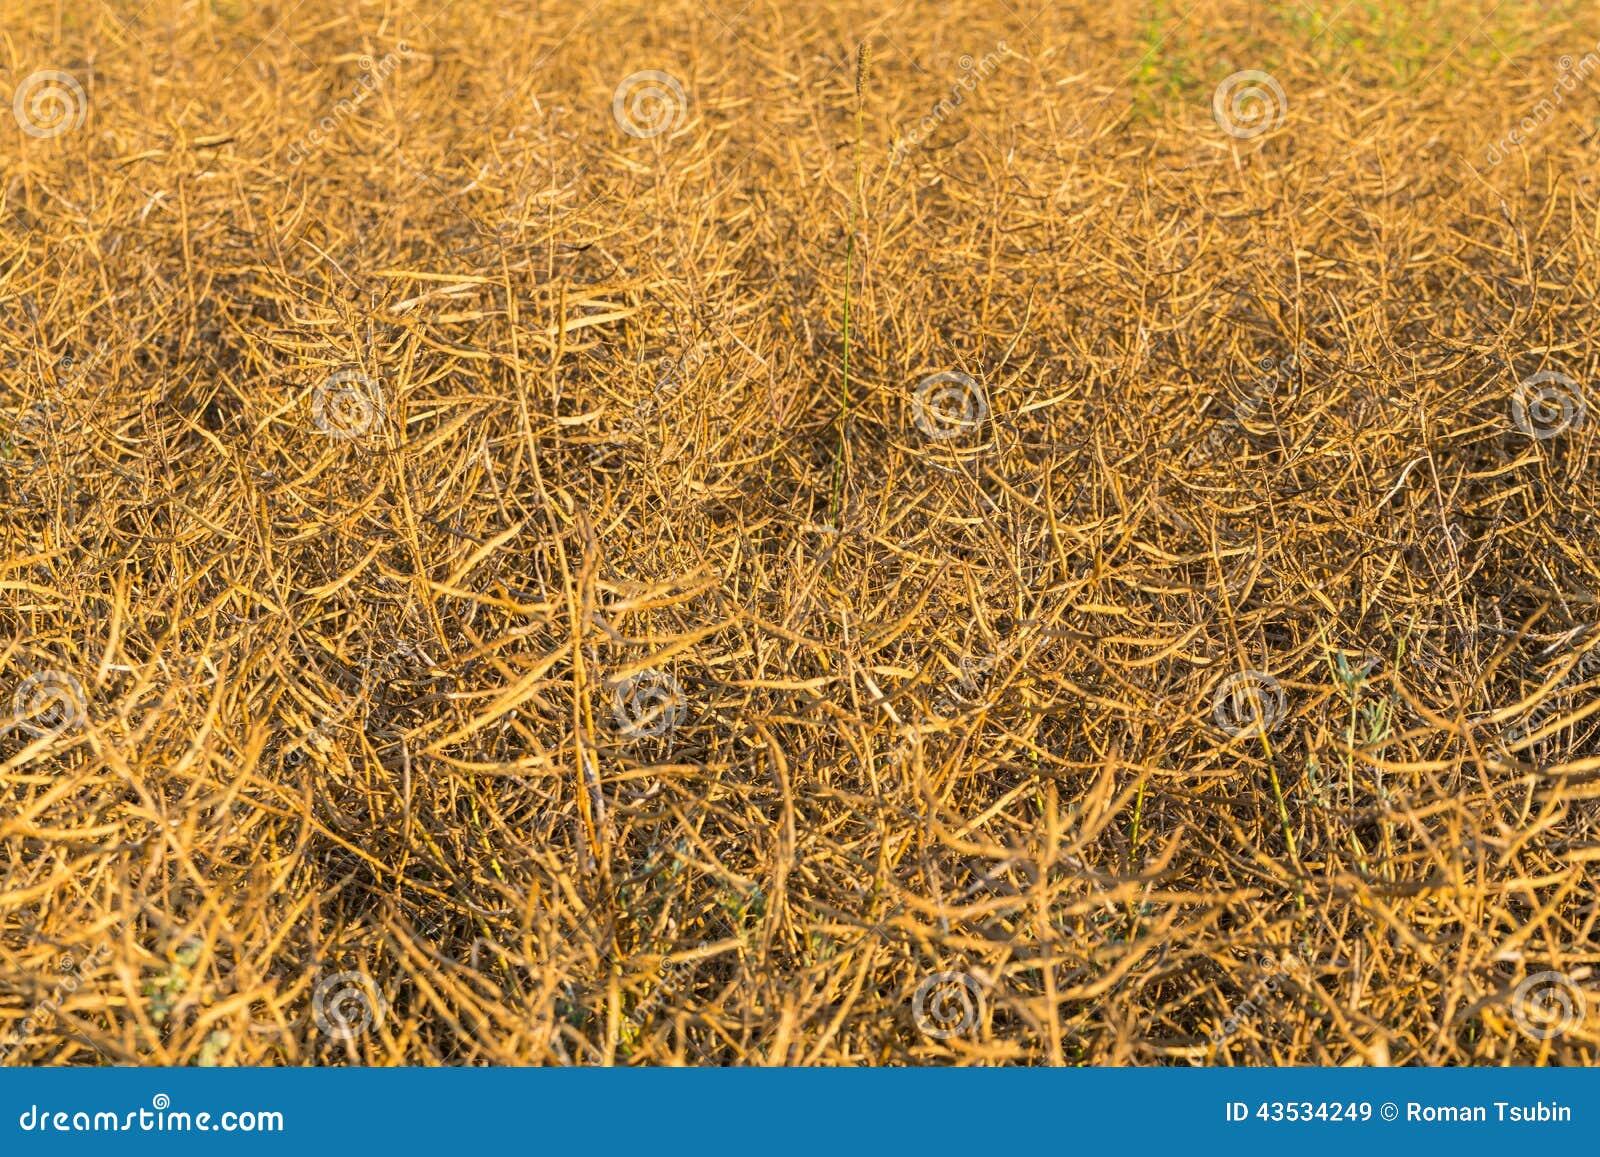 Maturidade da colza